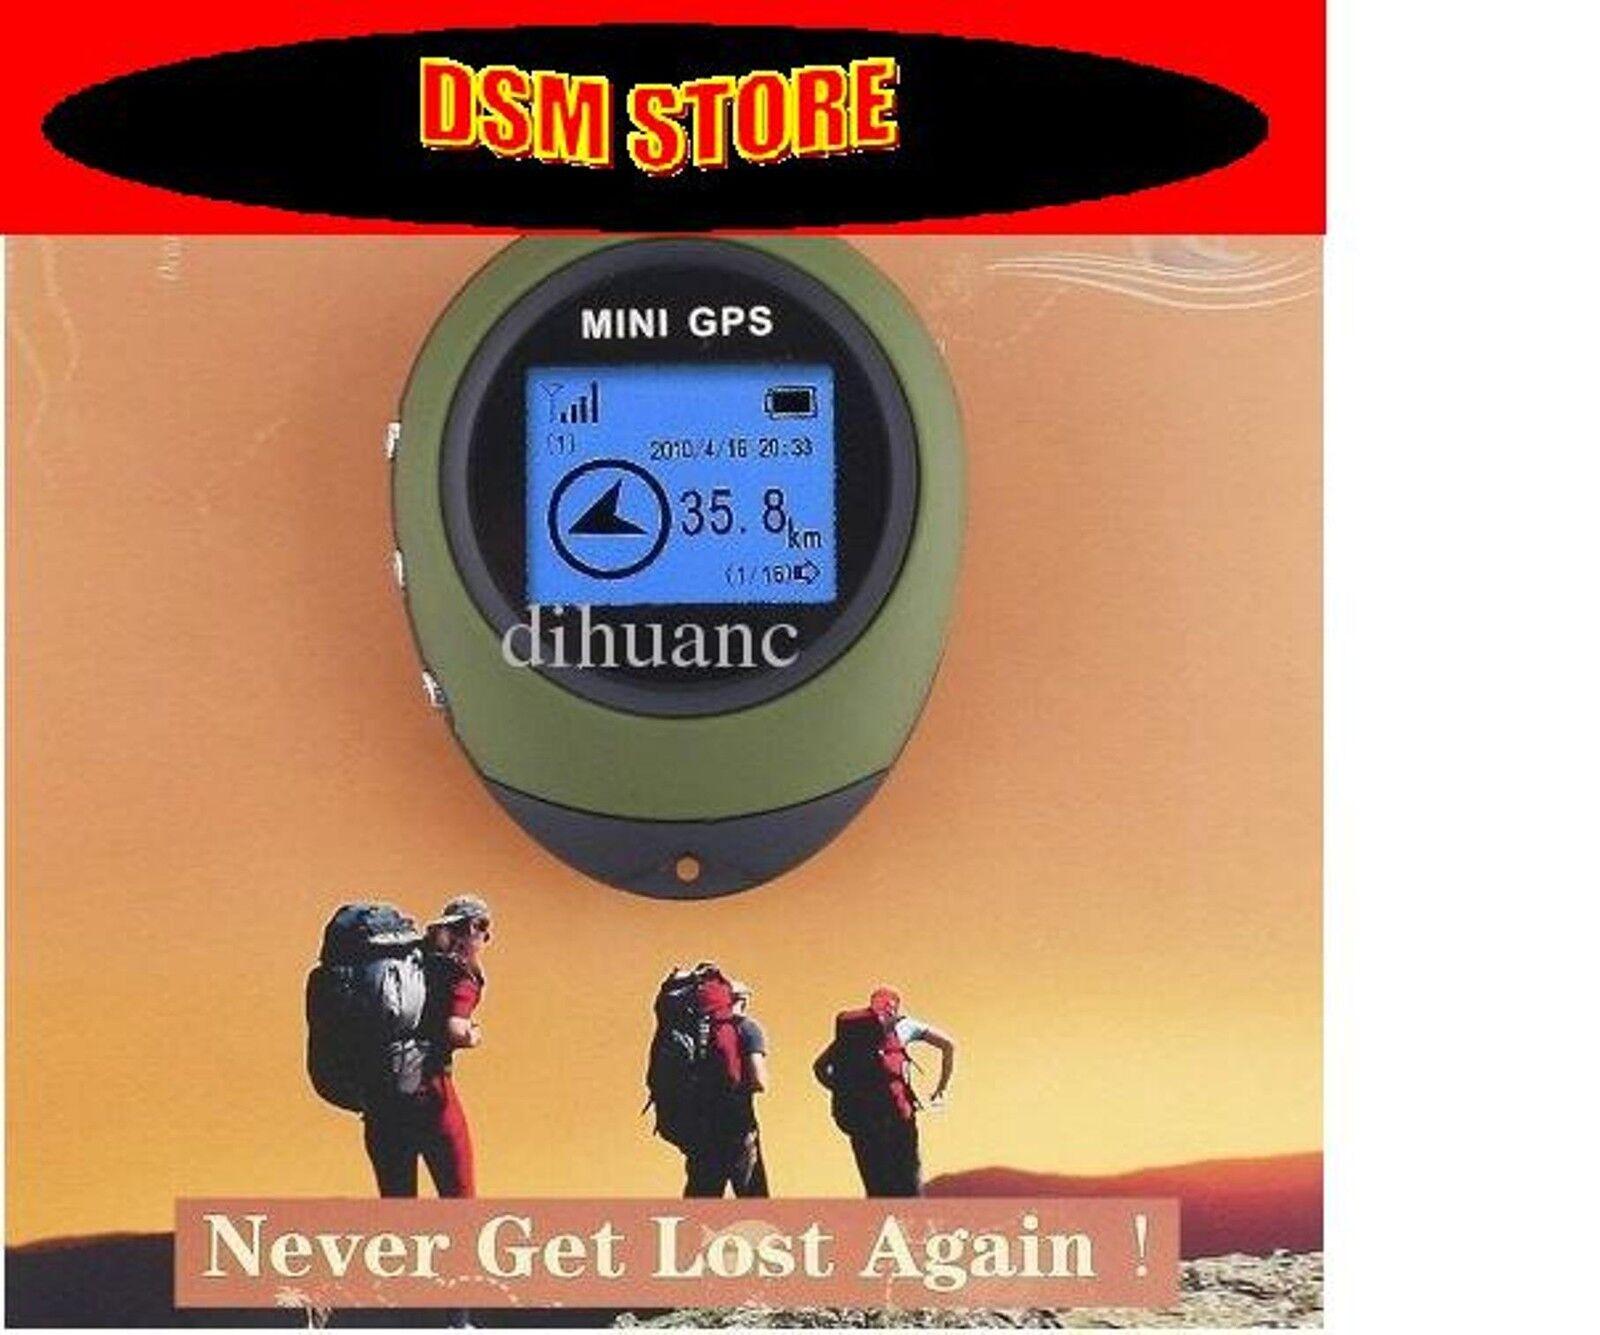 A0268 MINI GPS CARPFISHING SPINNING HOT SPOT BOILIES 16 WAYPOINT MEMORIA NEW